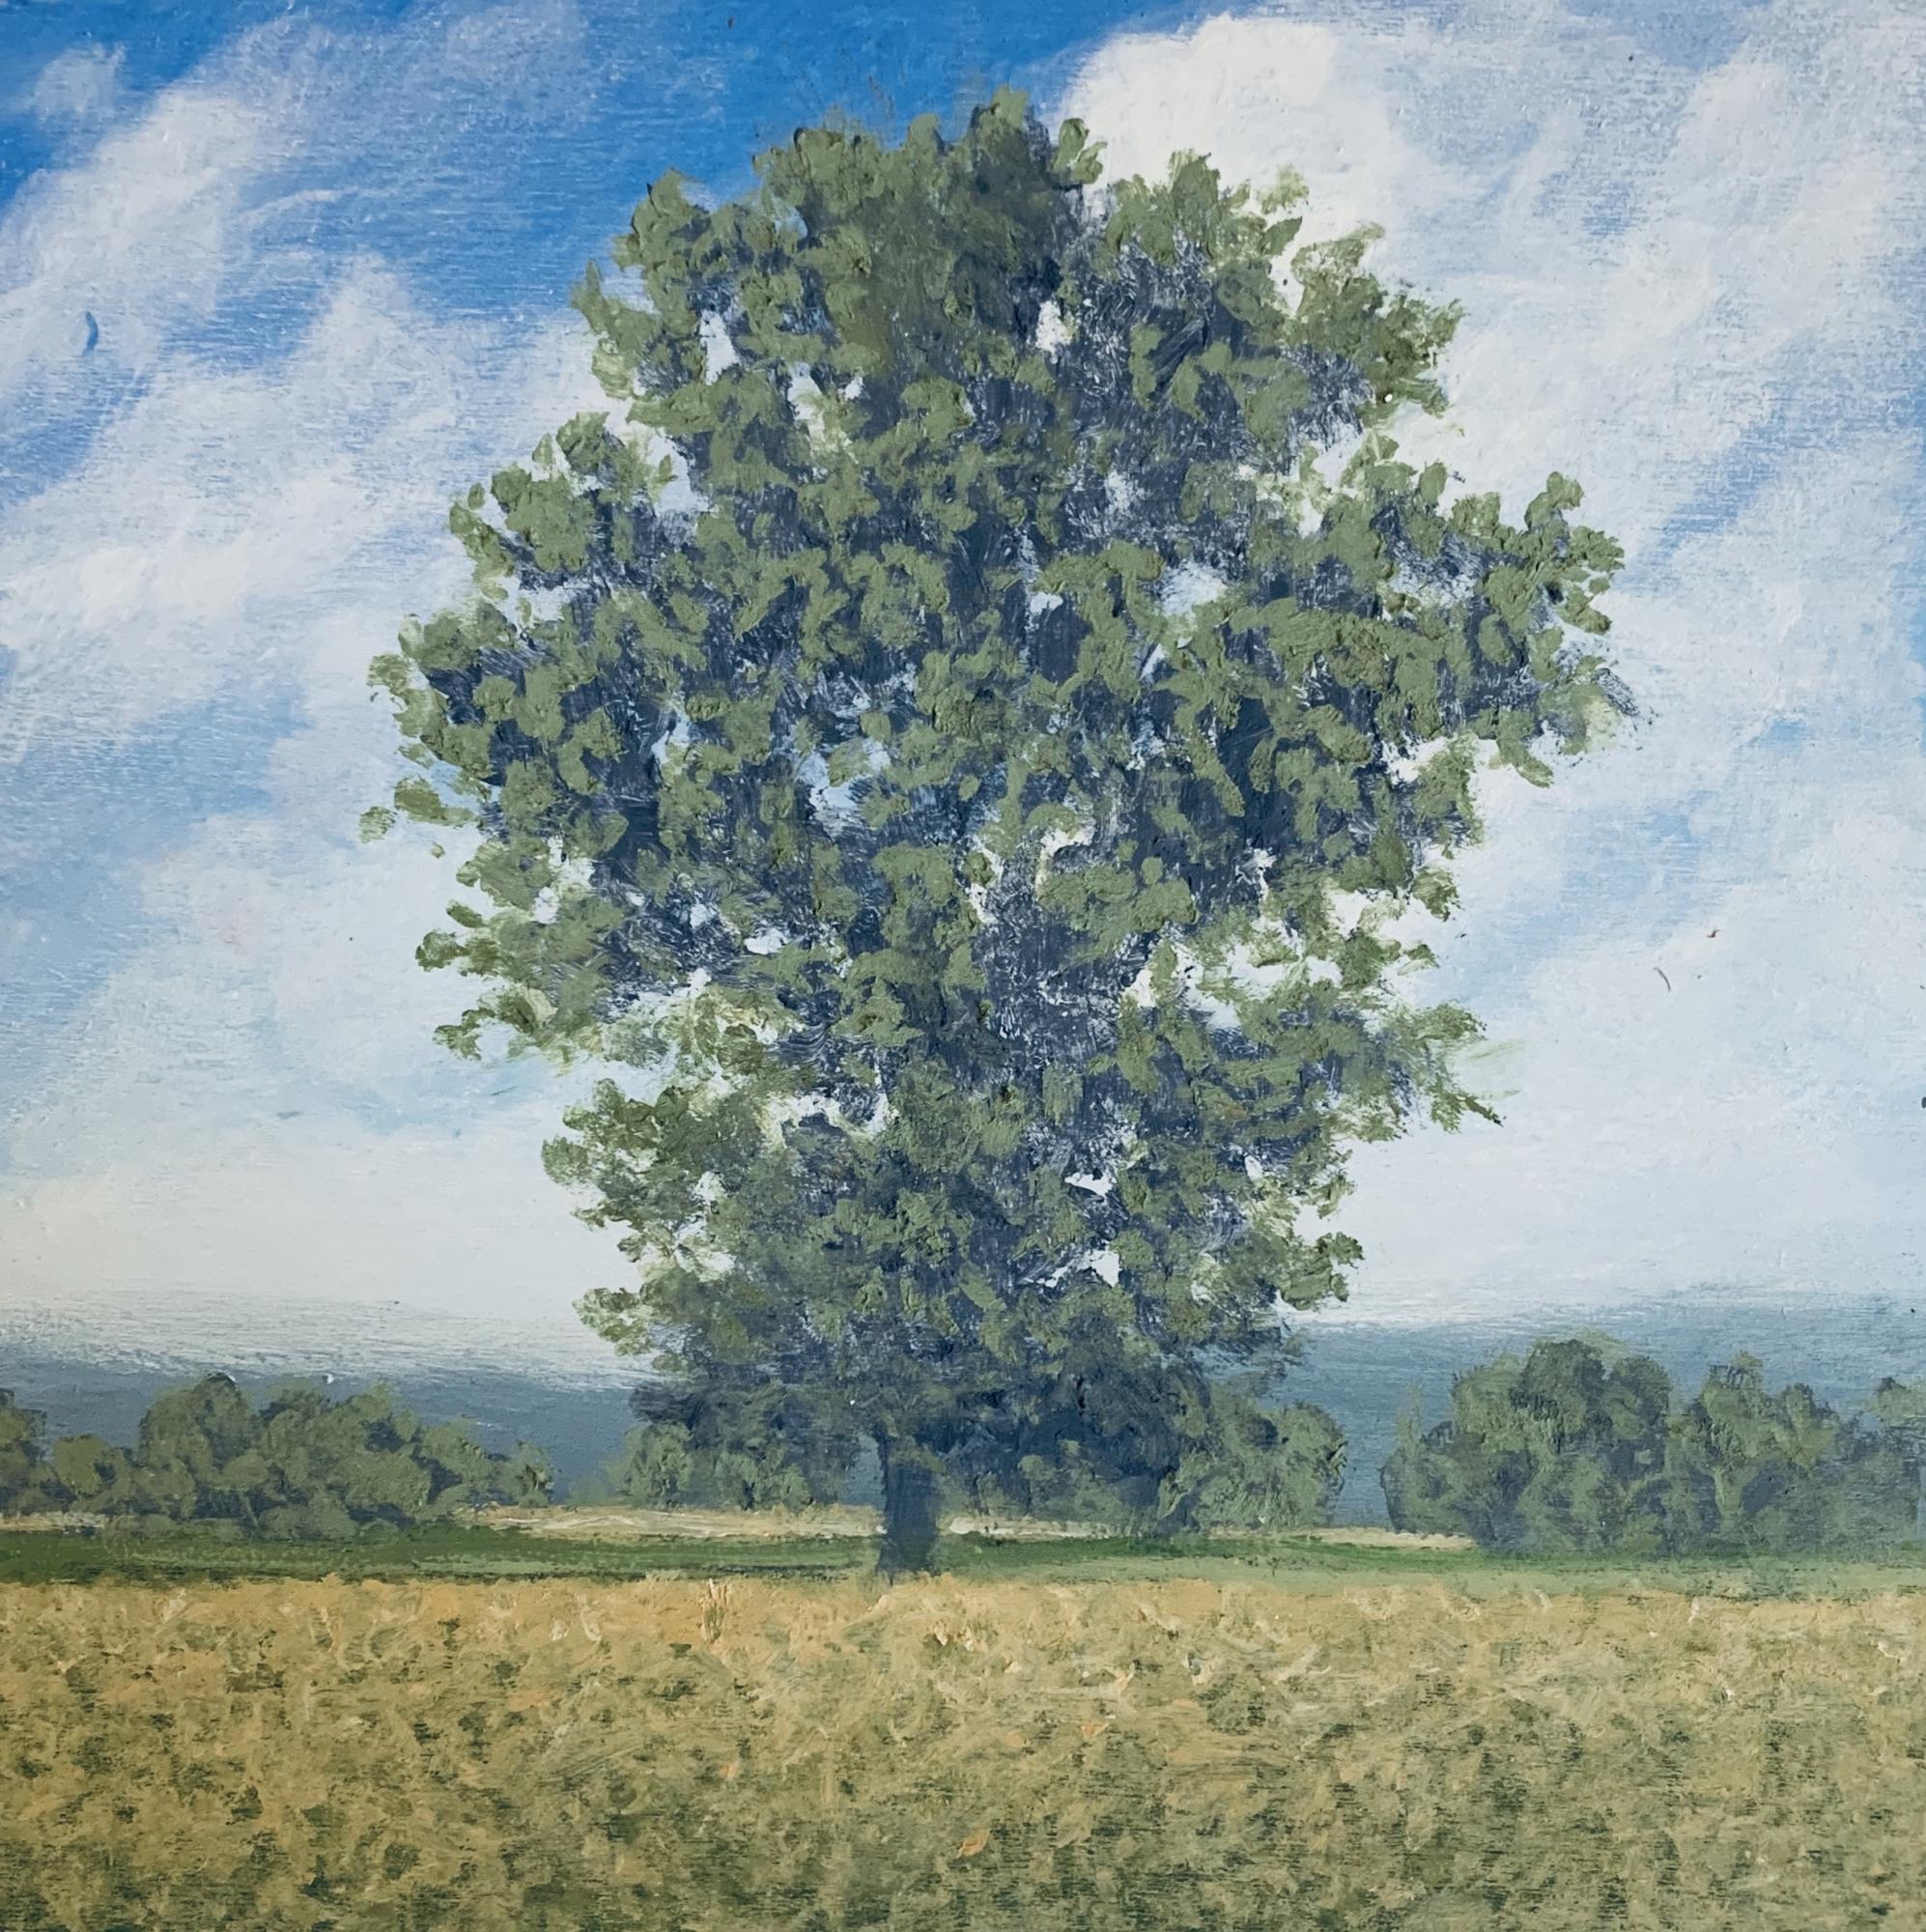 November Tree 3 by Richard Herman